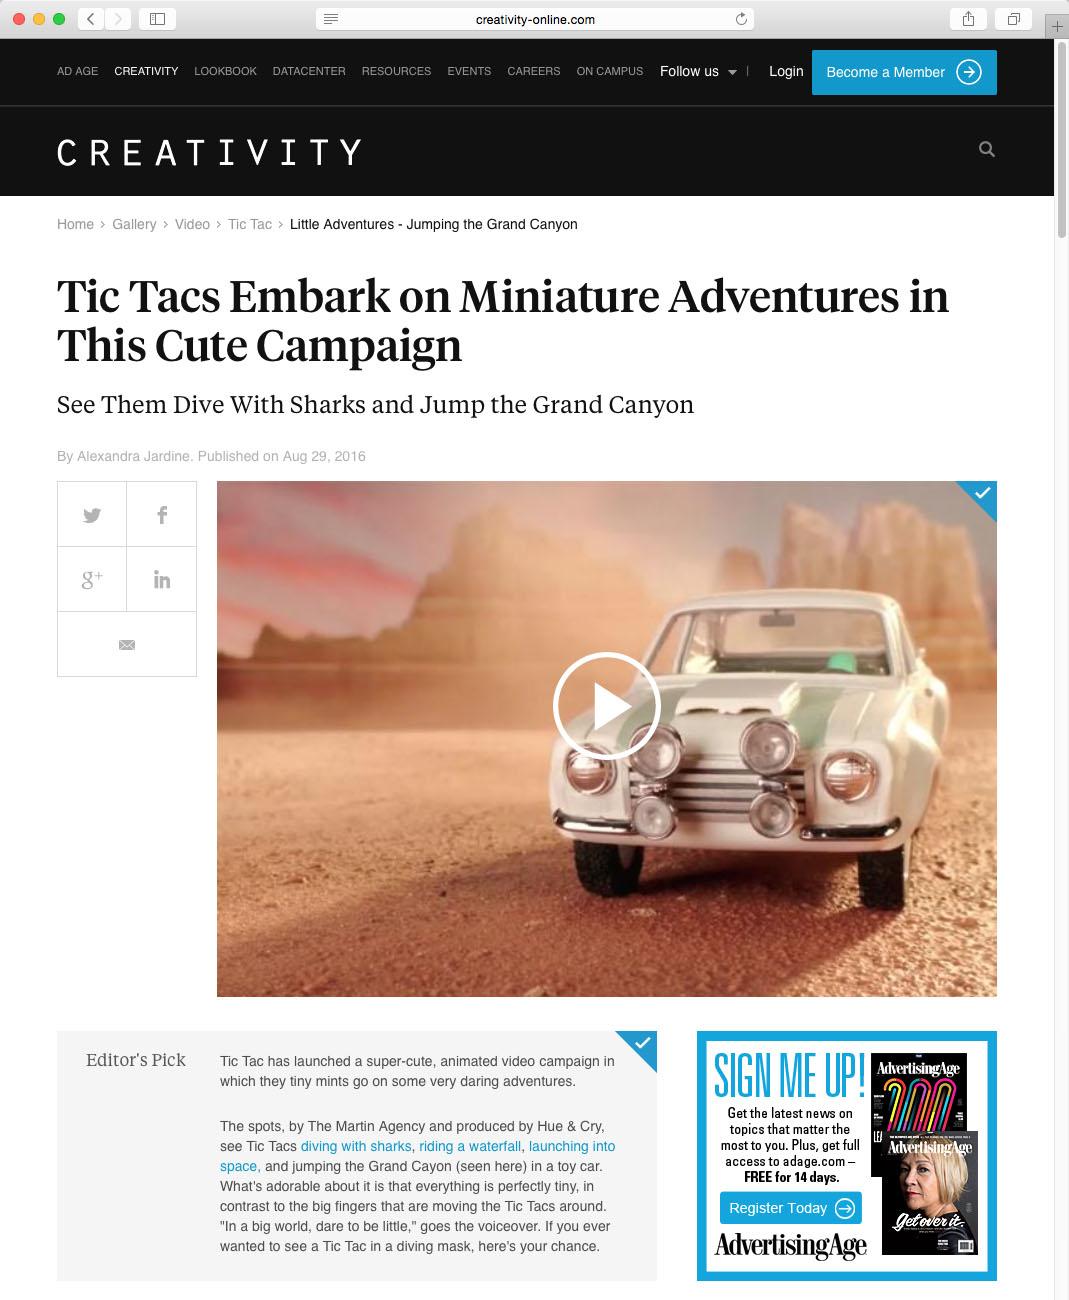 TicTac_Creativity_01.jpg